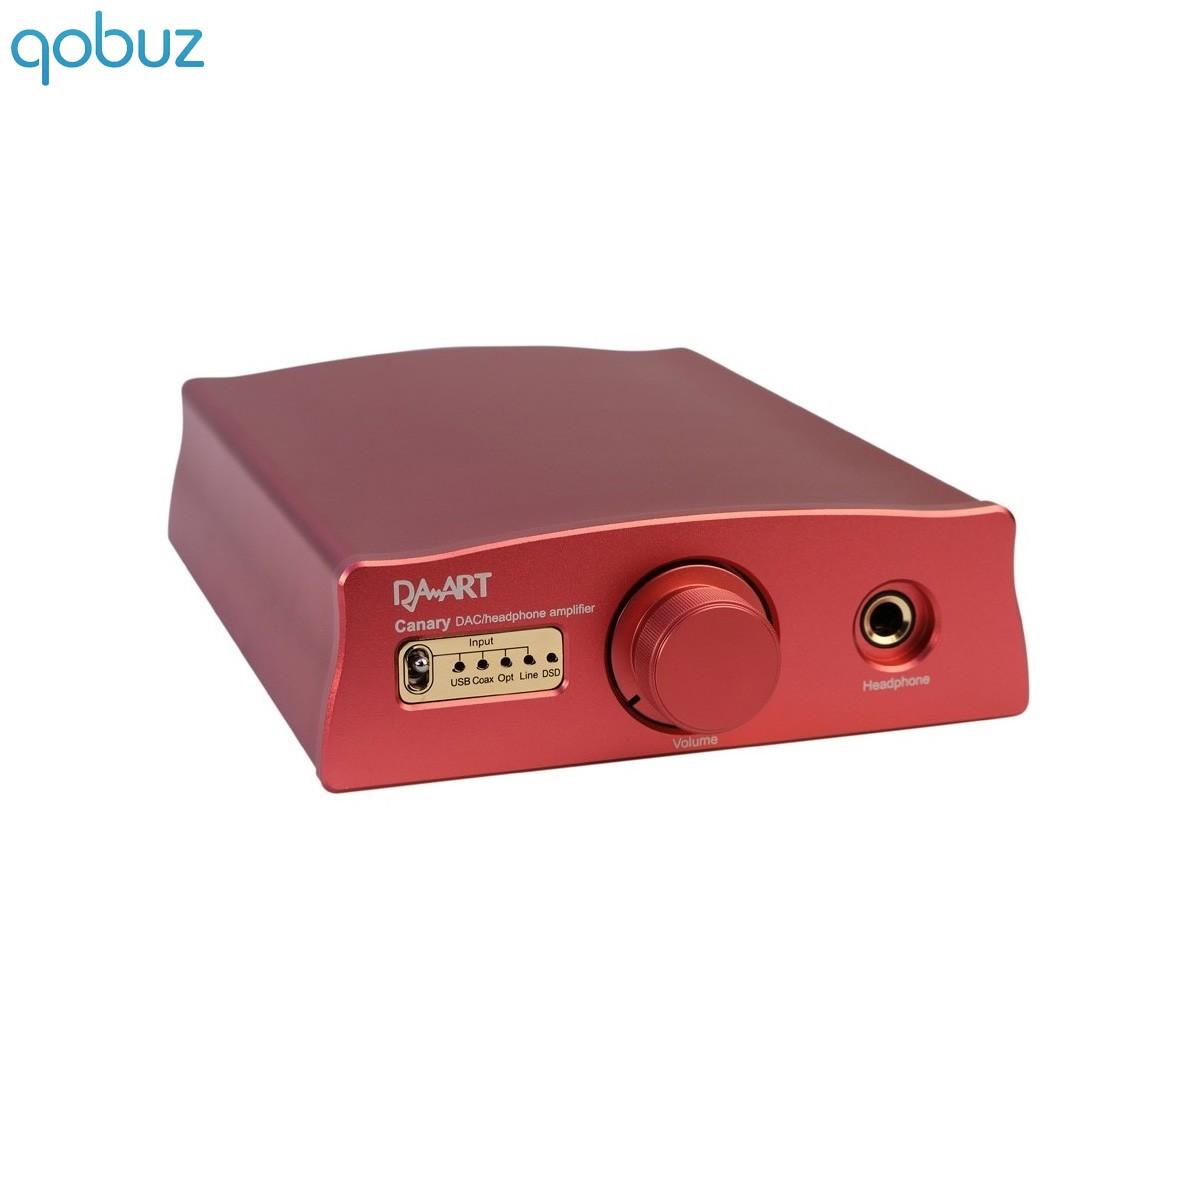 DAART Canary DAC USB XMOS DSD ES9018K2M 32Bit Headphone out class A Red